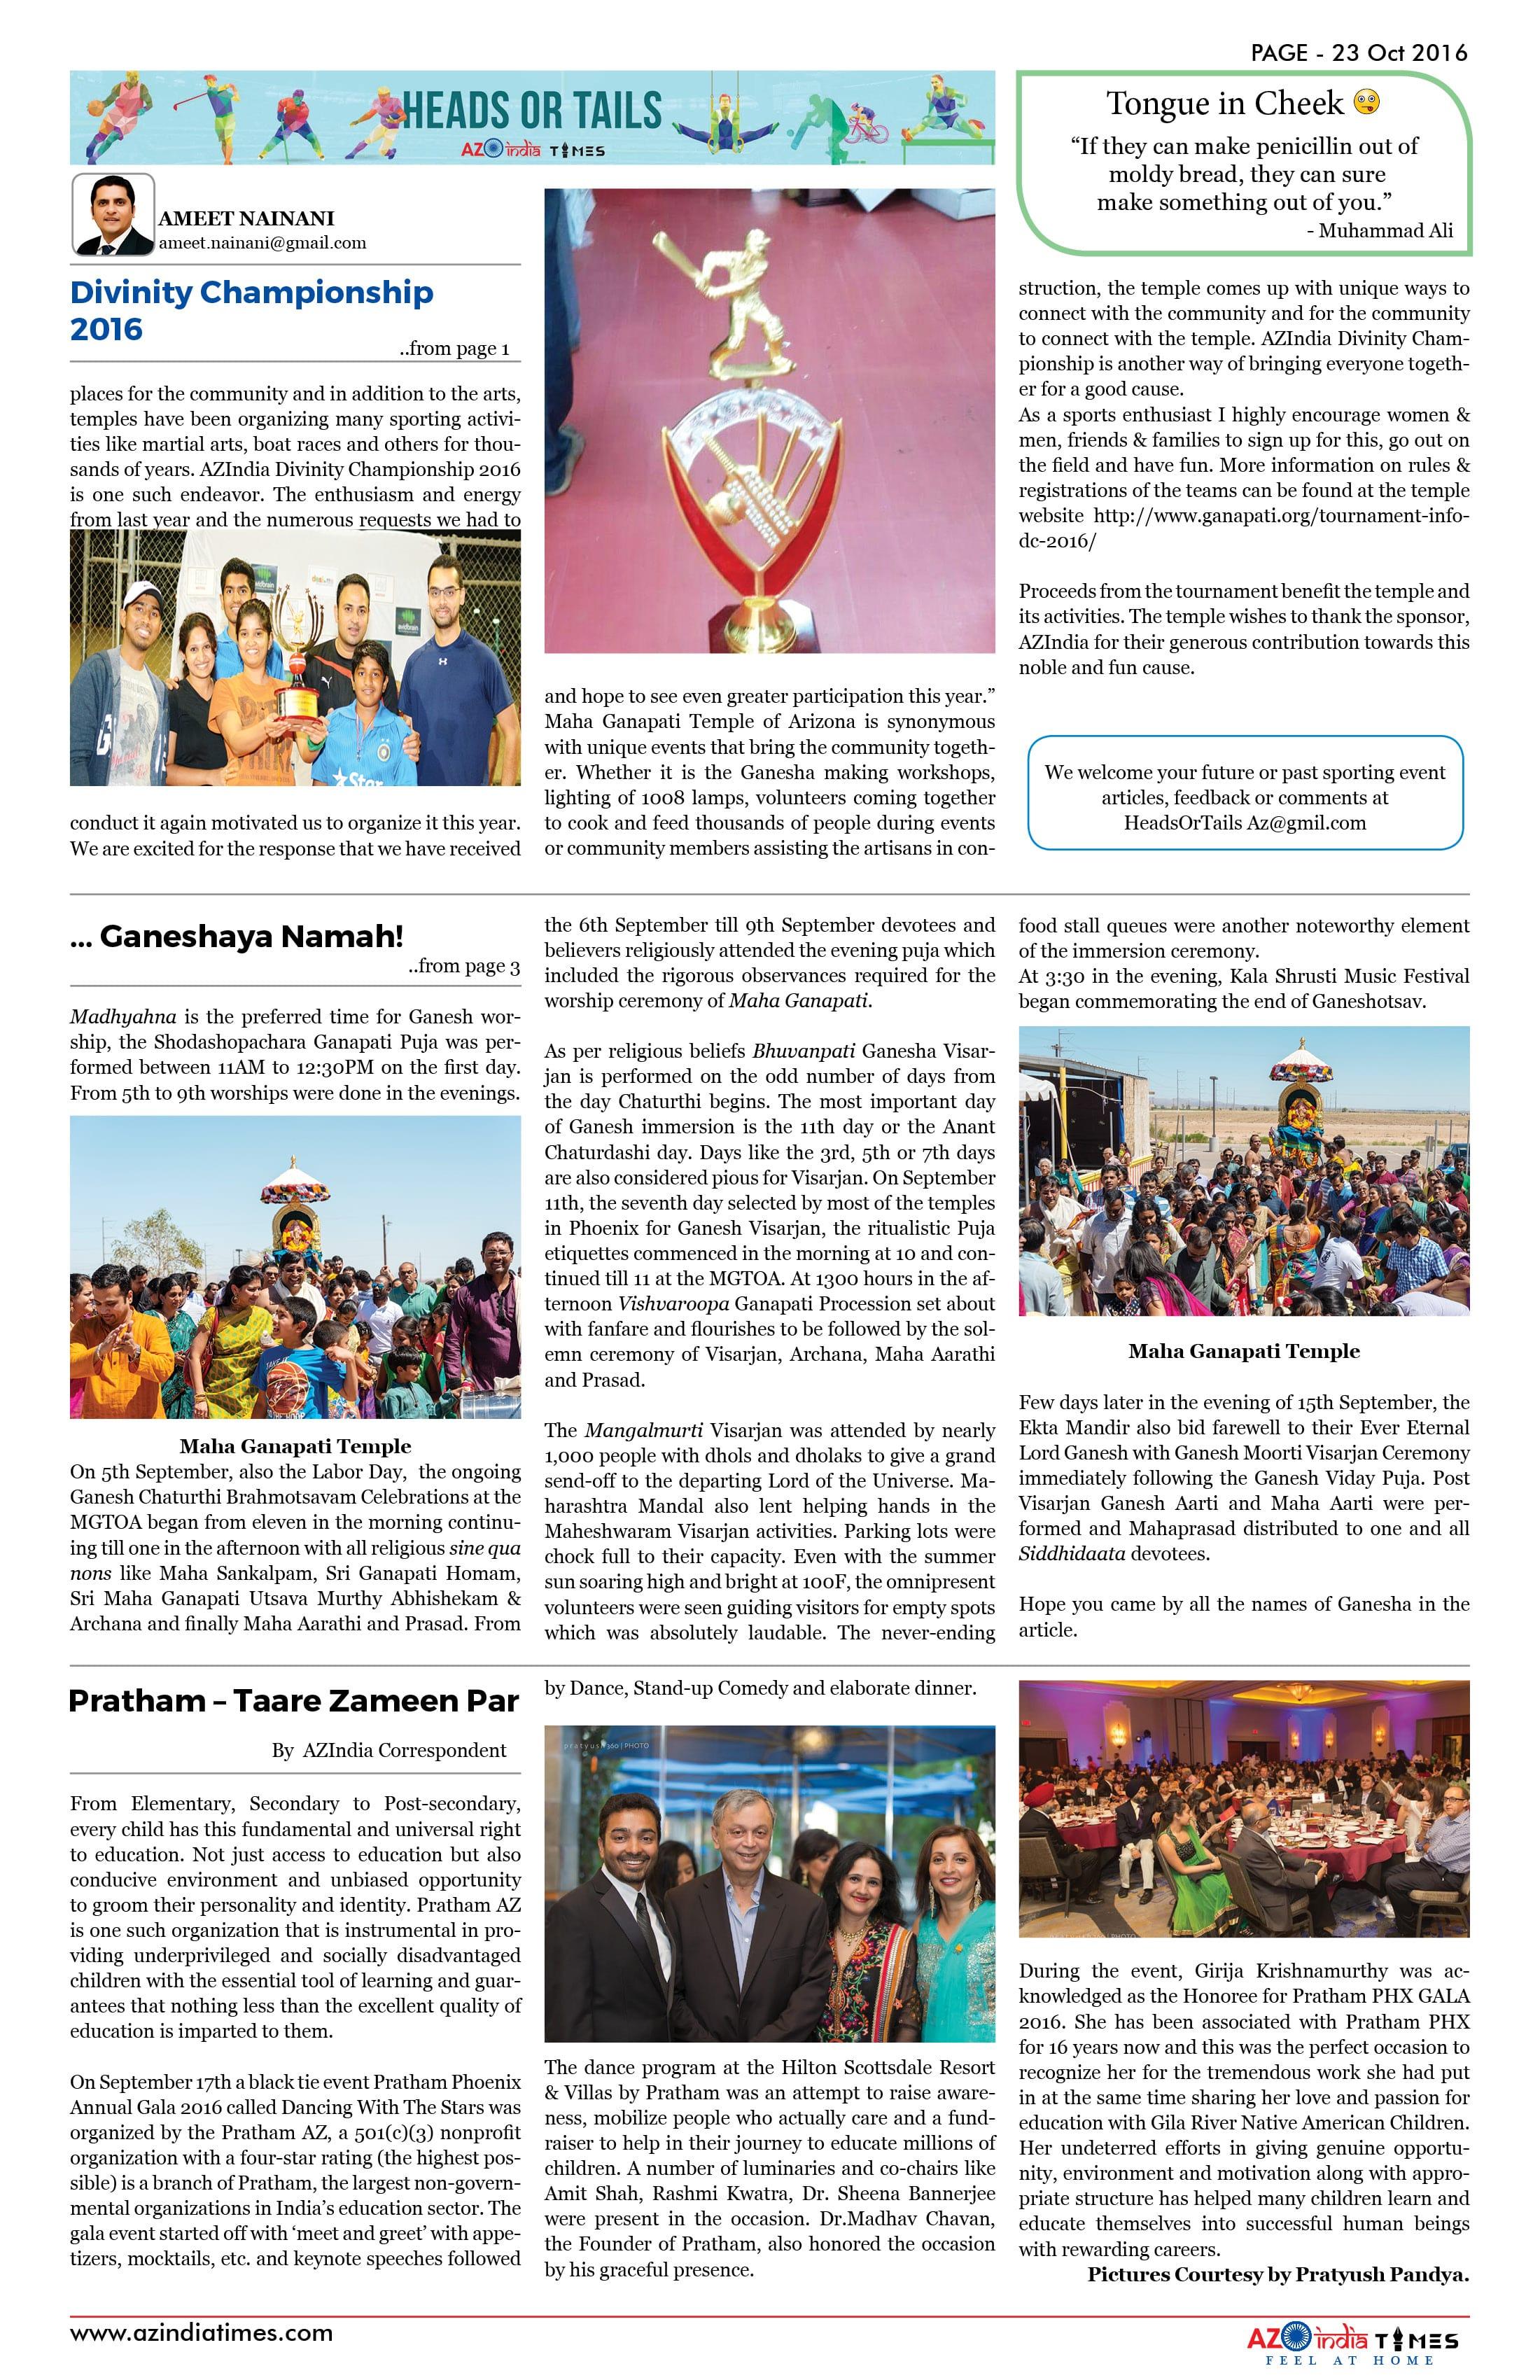 AZINDIA NEWS PAPER23